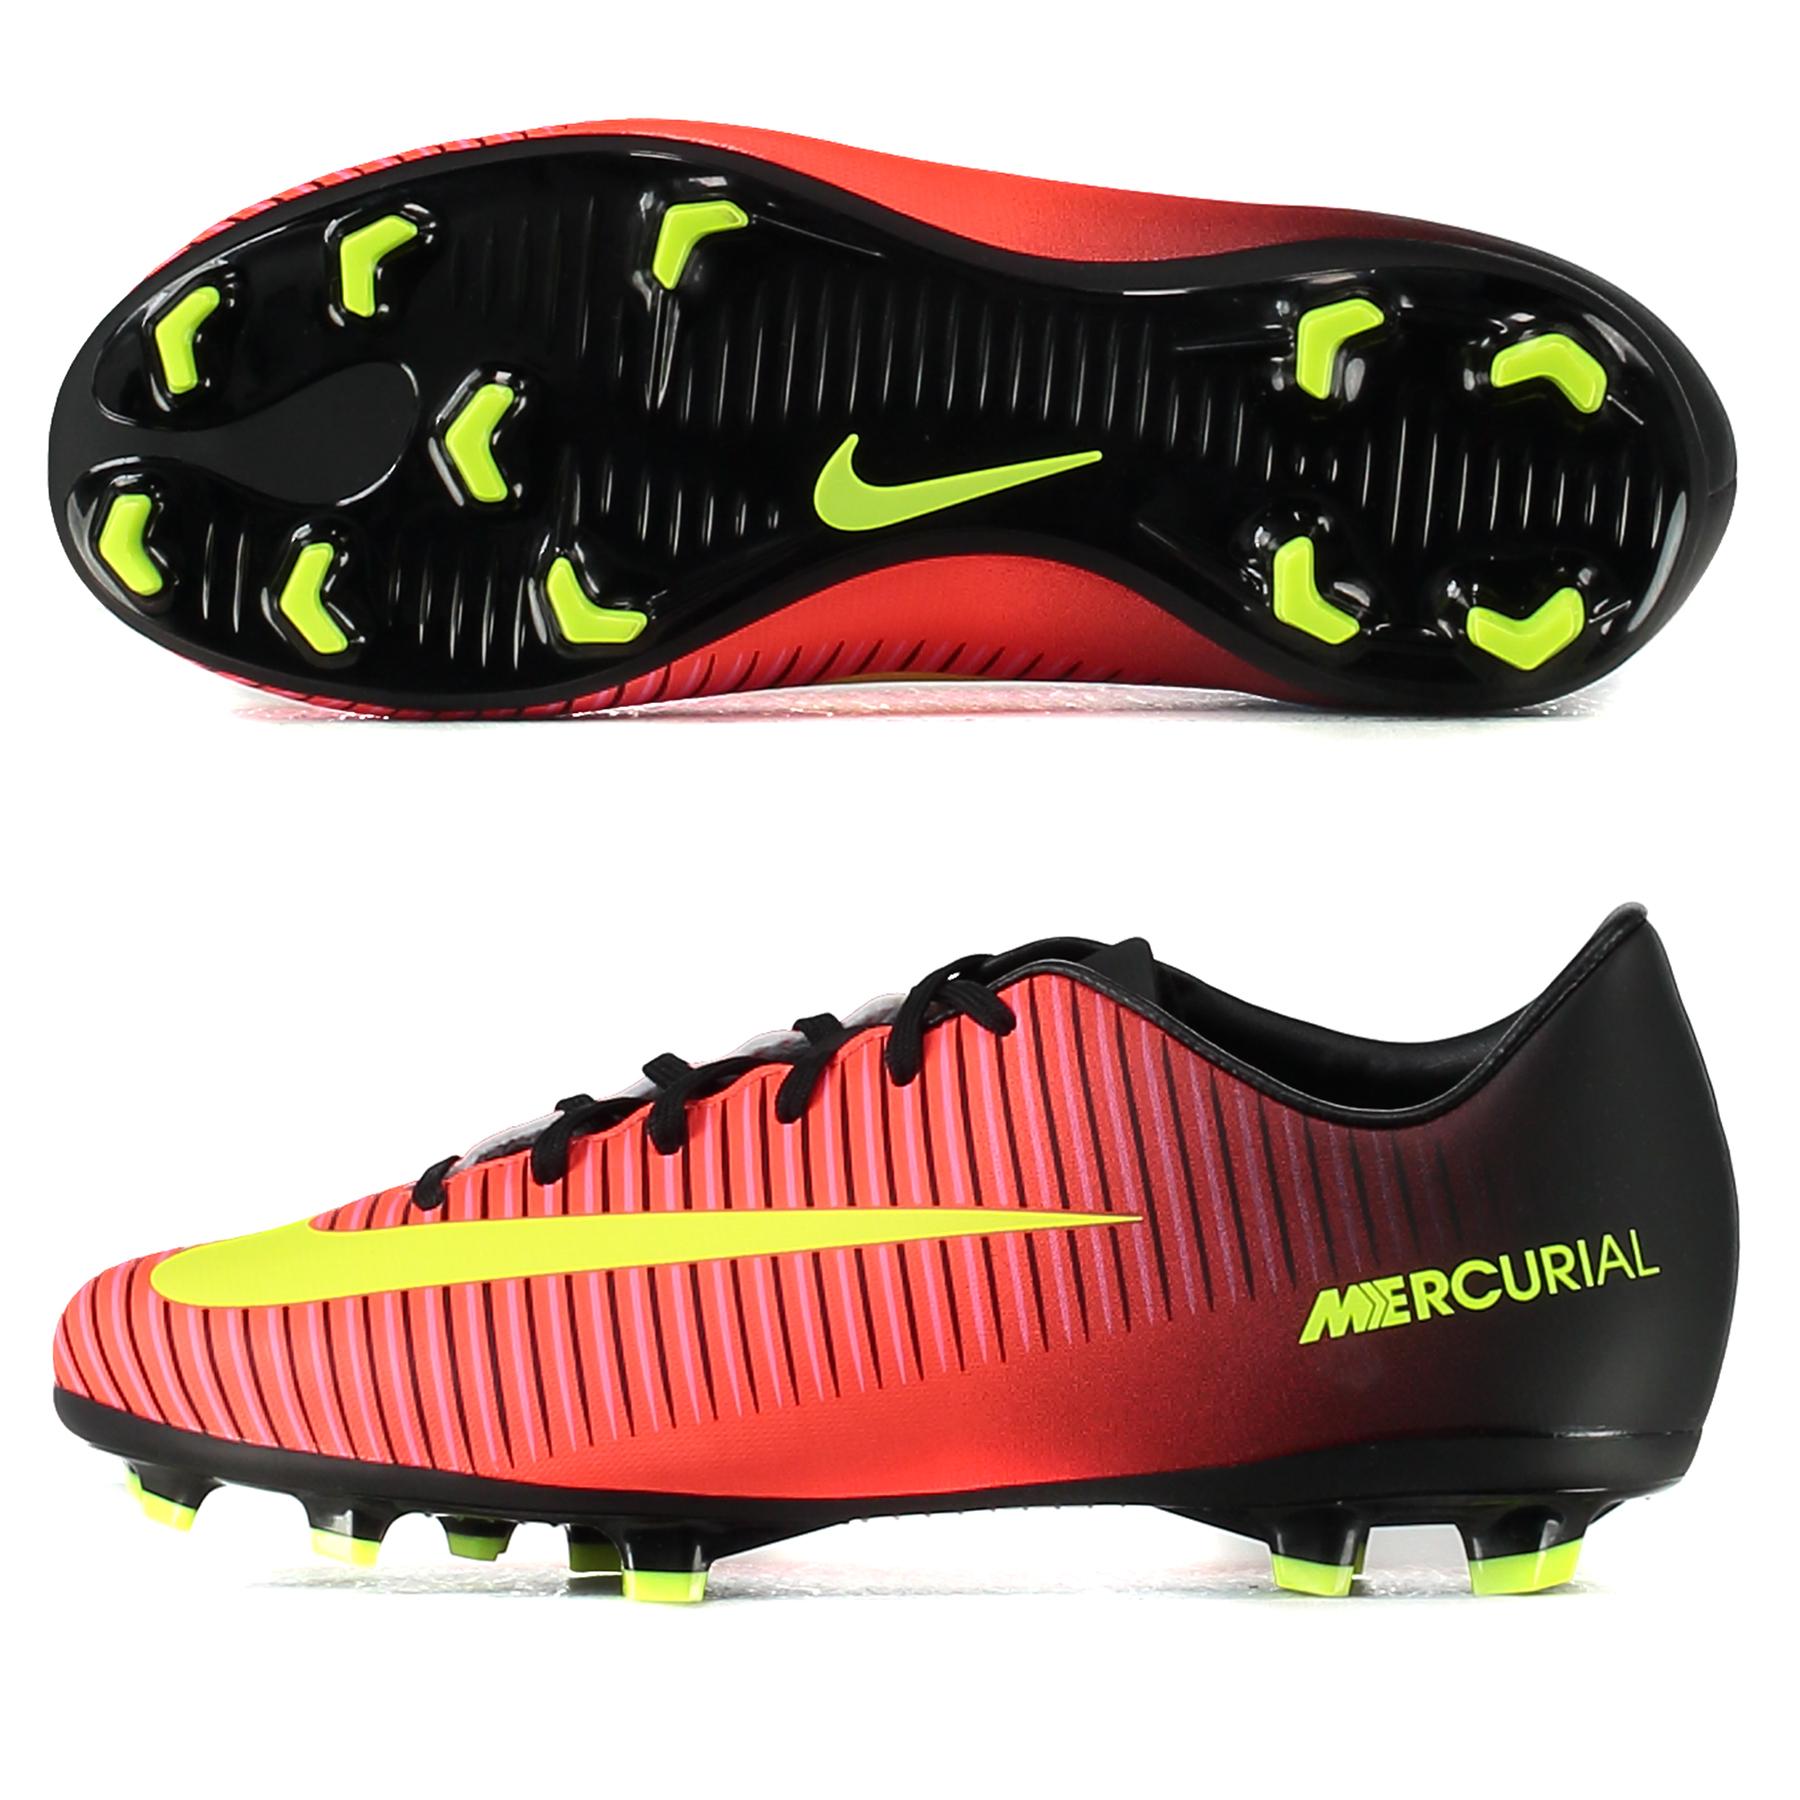 Nike Mercurial Vapor XI FG Total Crimson/Vol